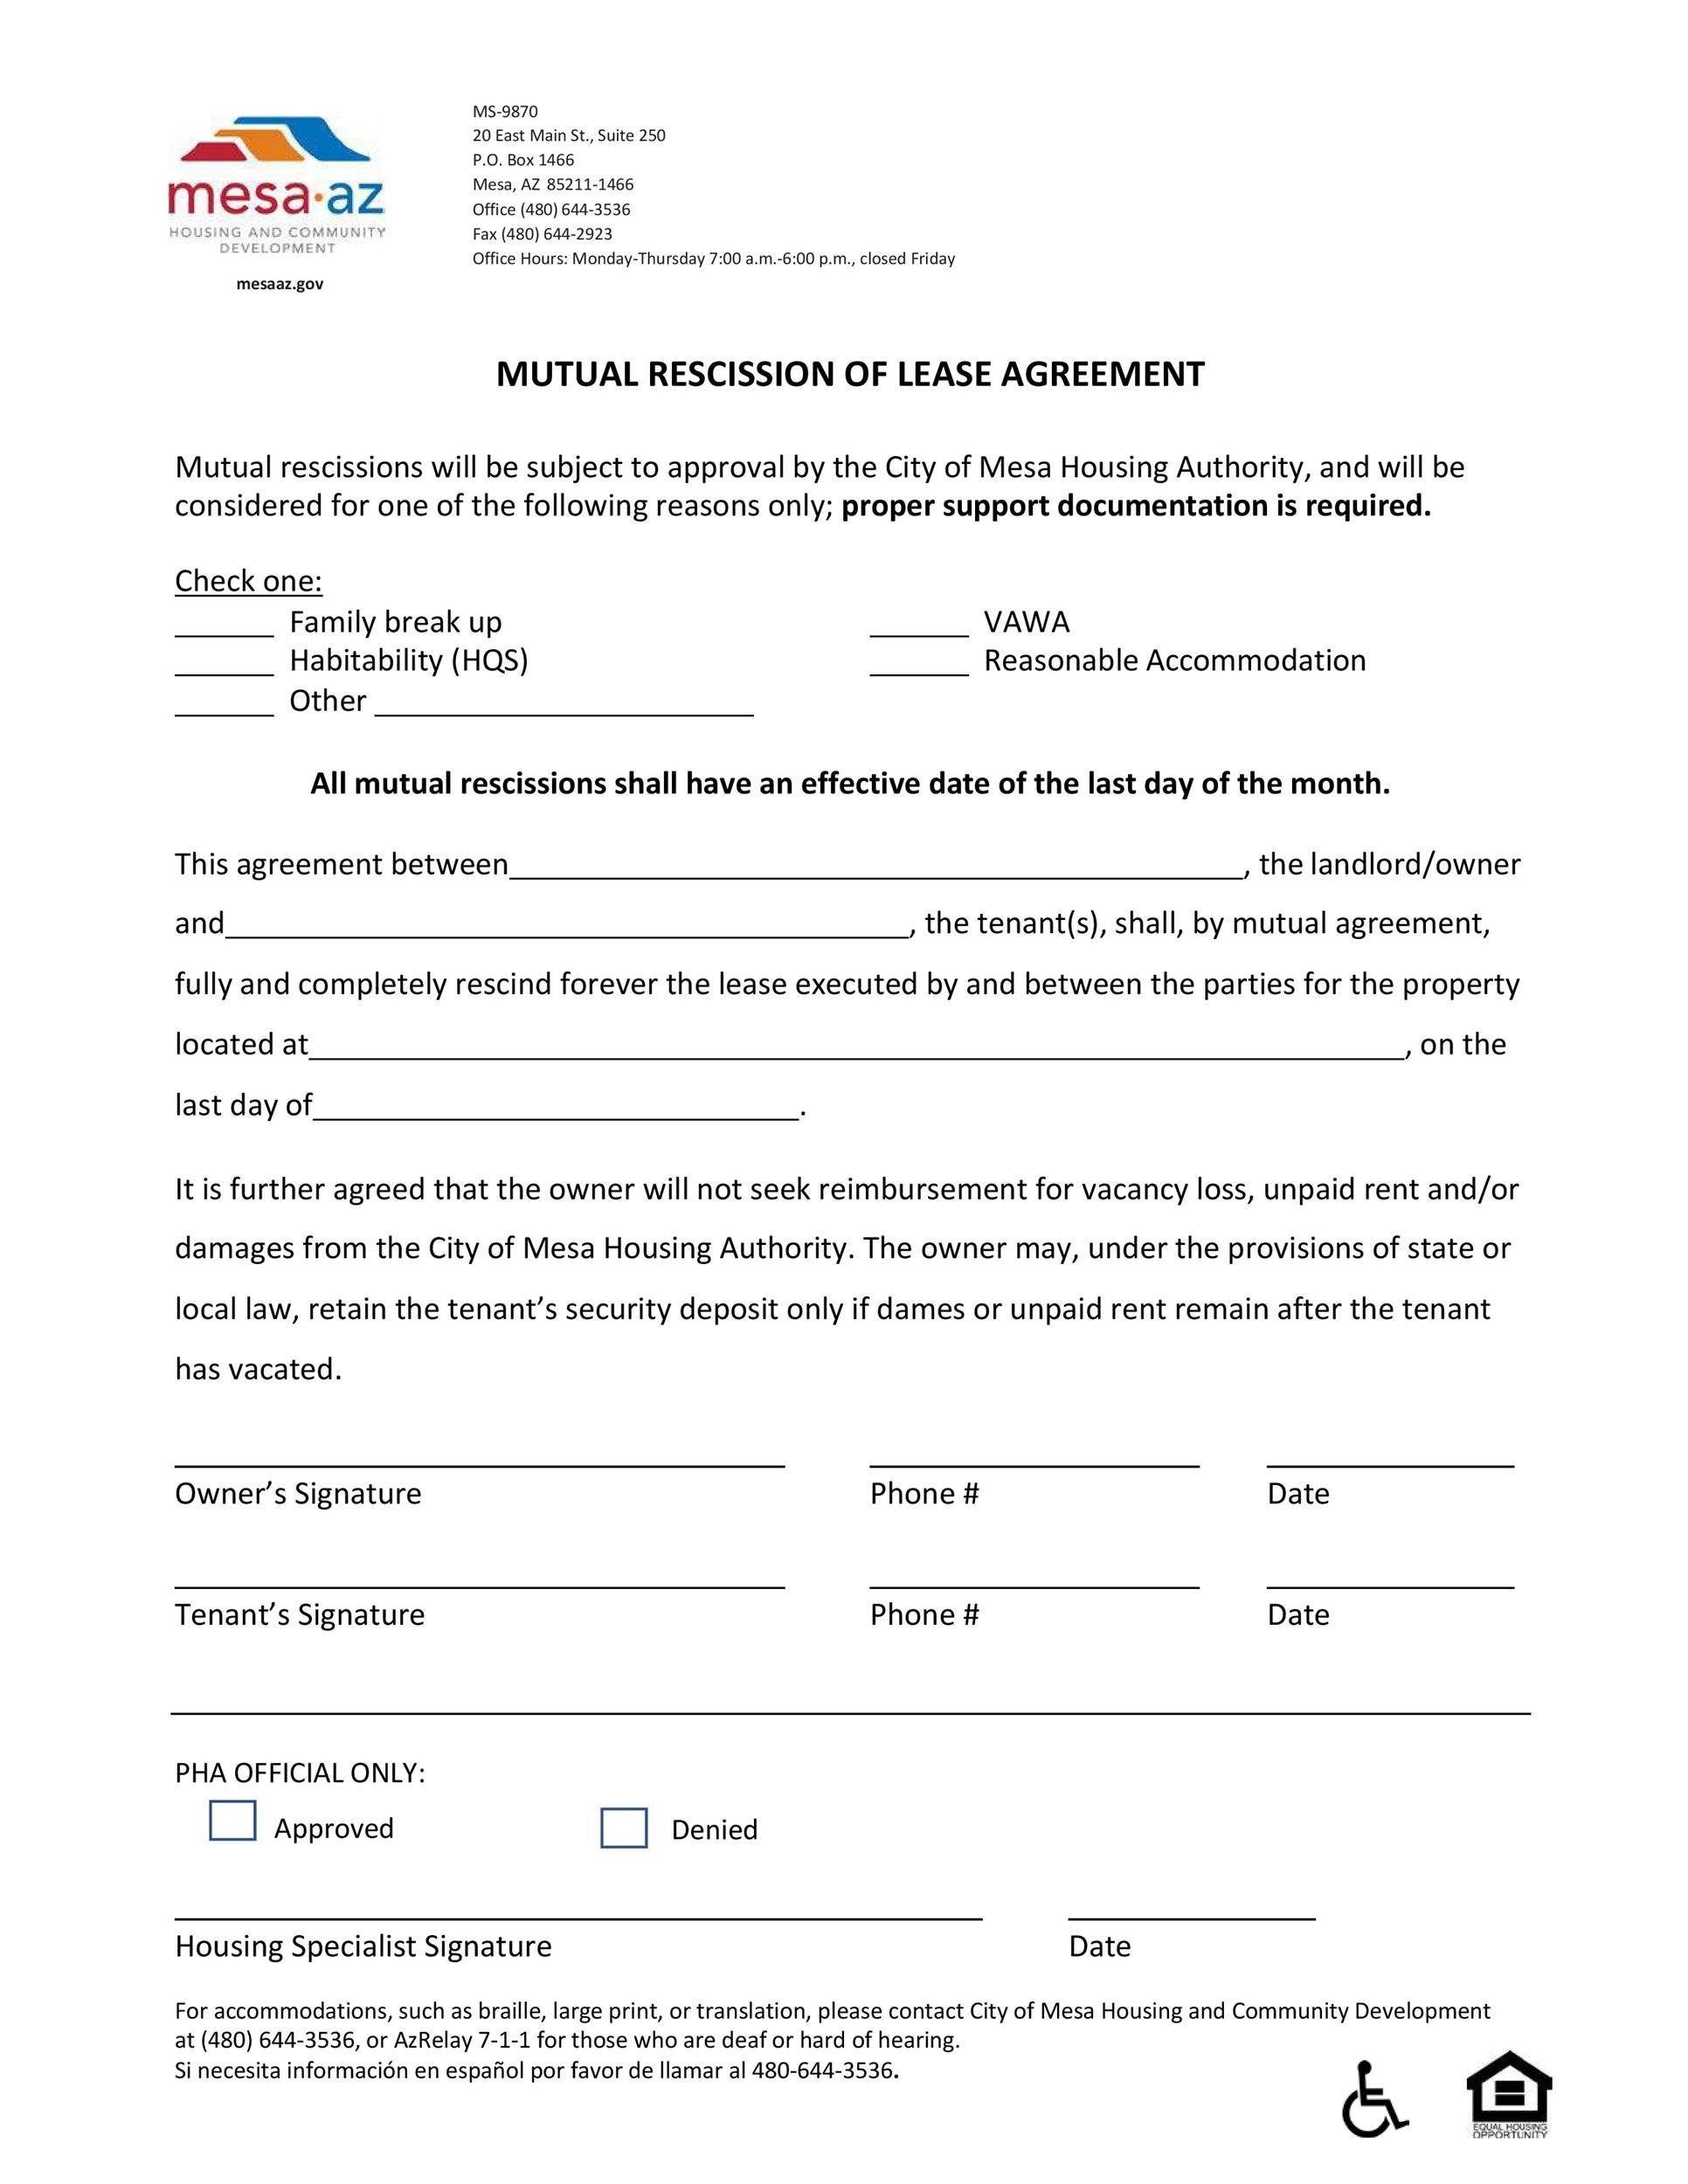 Free rescission agreement 27